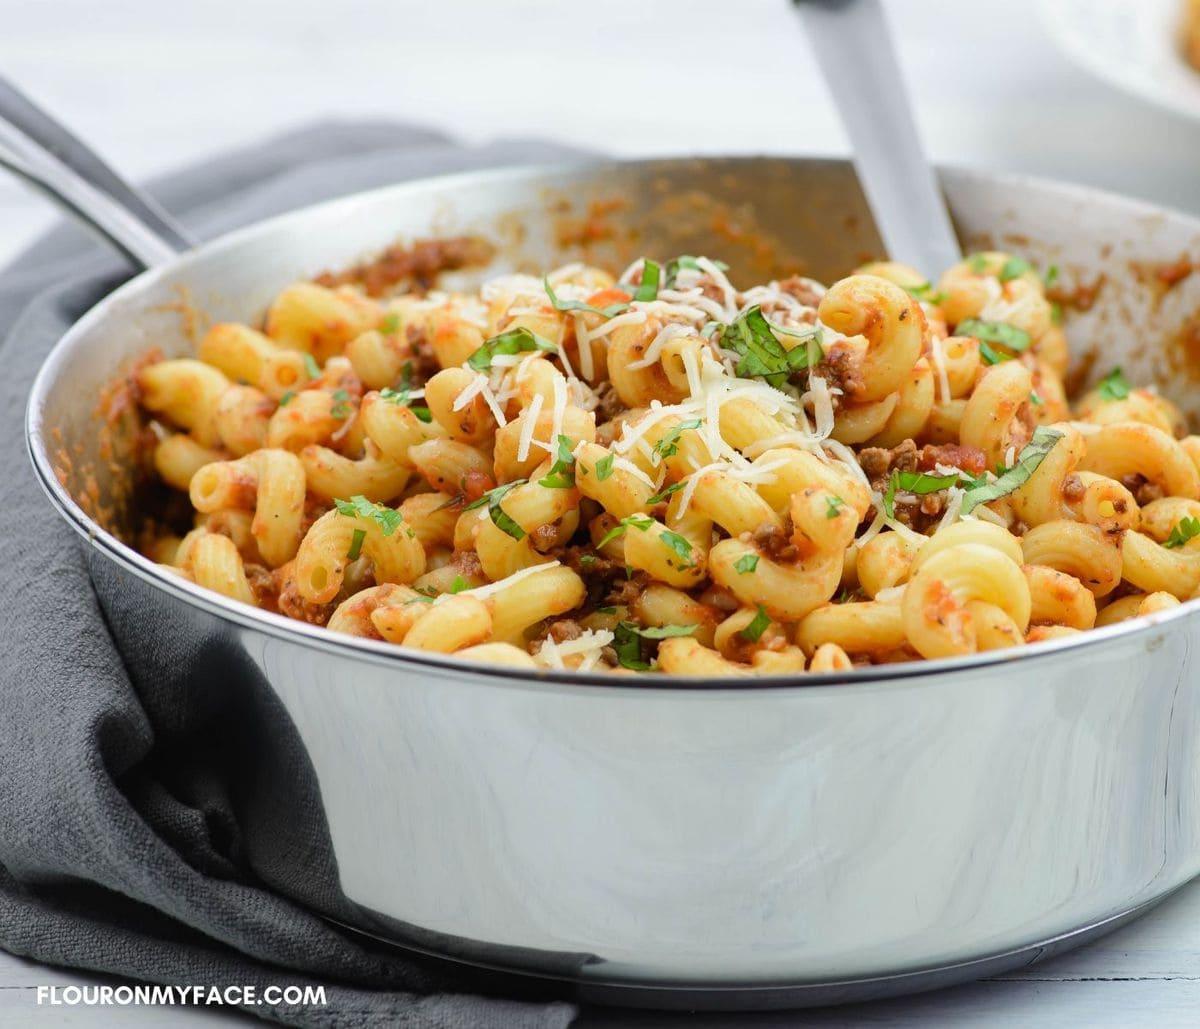 Serving skillet pasta from a deep skillet.